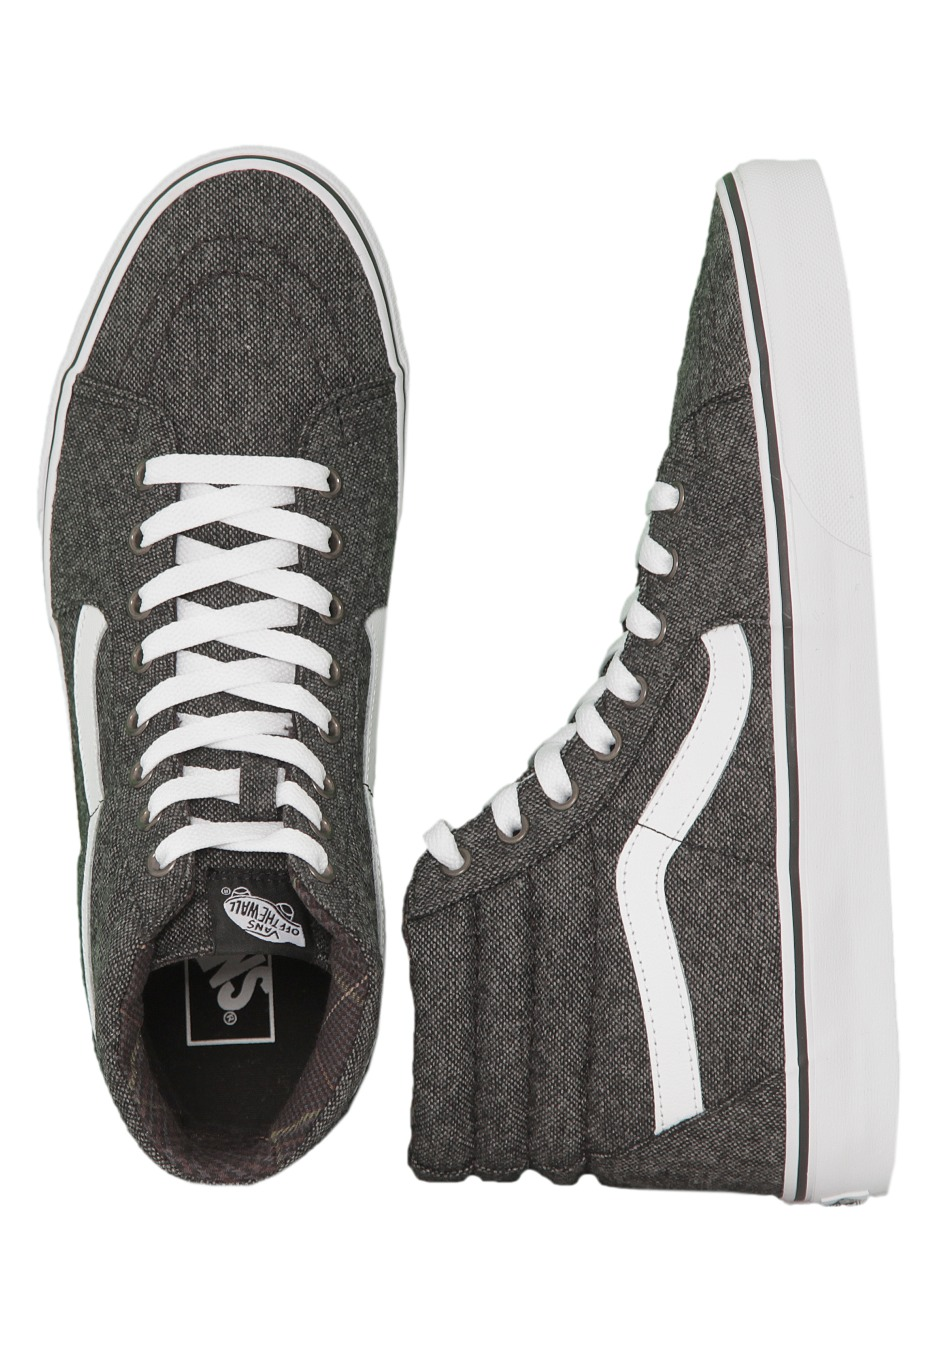 d2b0872e4a24e5 Vans - Sk8-Hi Reissue Tweed Black True White - Shoes - Impericon.com UK